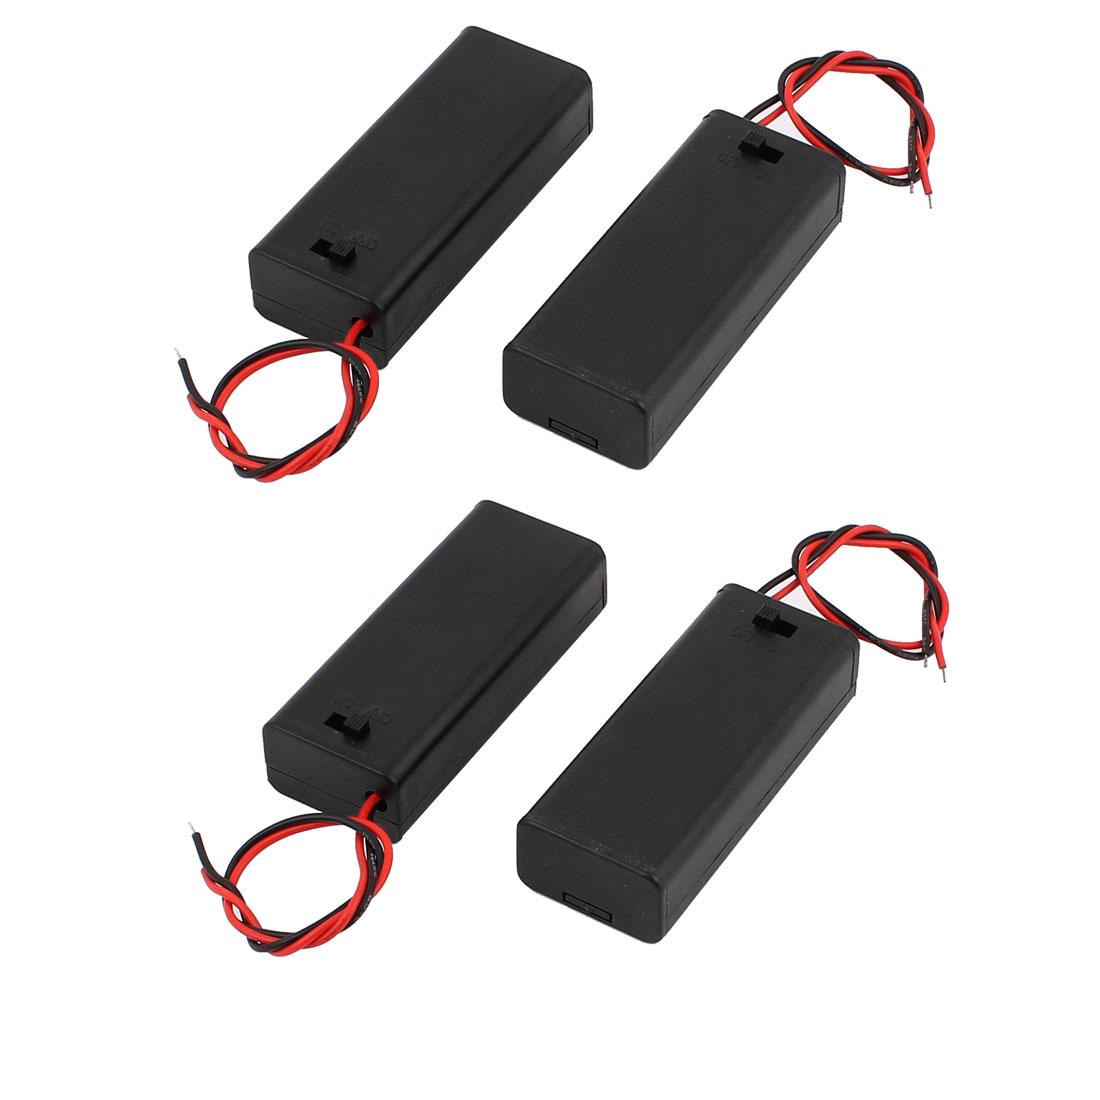 4 Pcs 2 x 1.5V AAA Switch Battery Holder Plastic Shell Case Storage Black